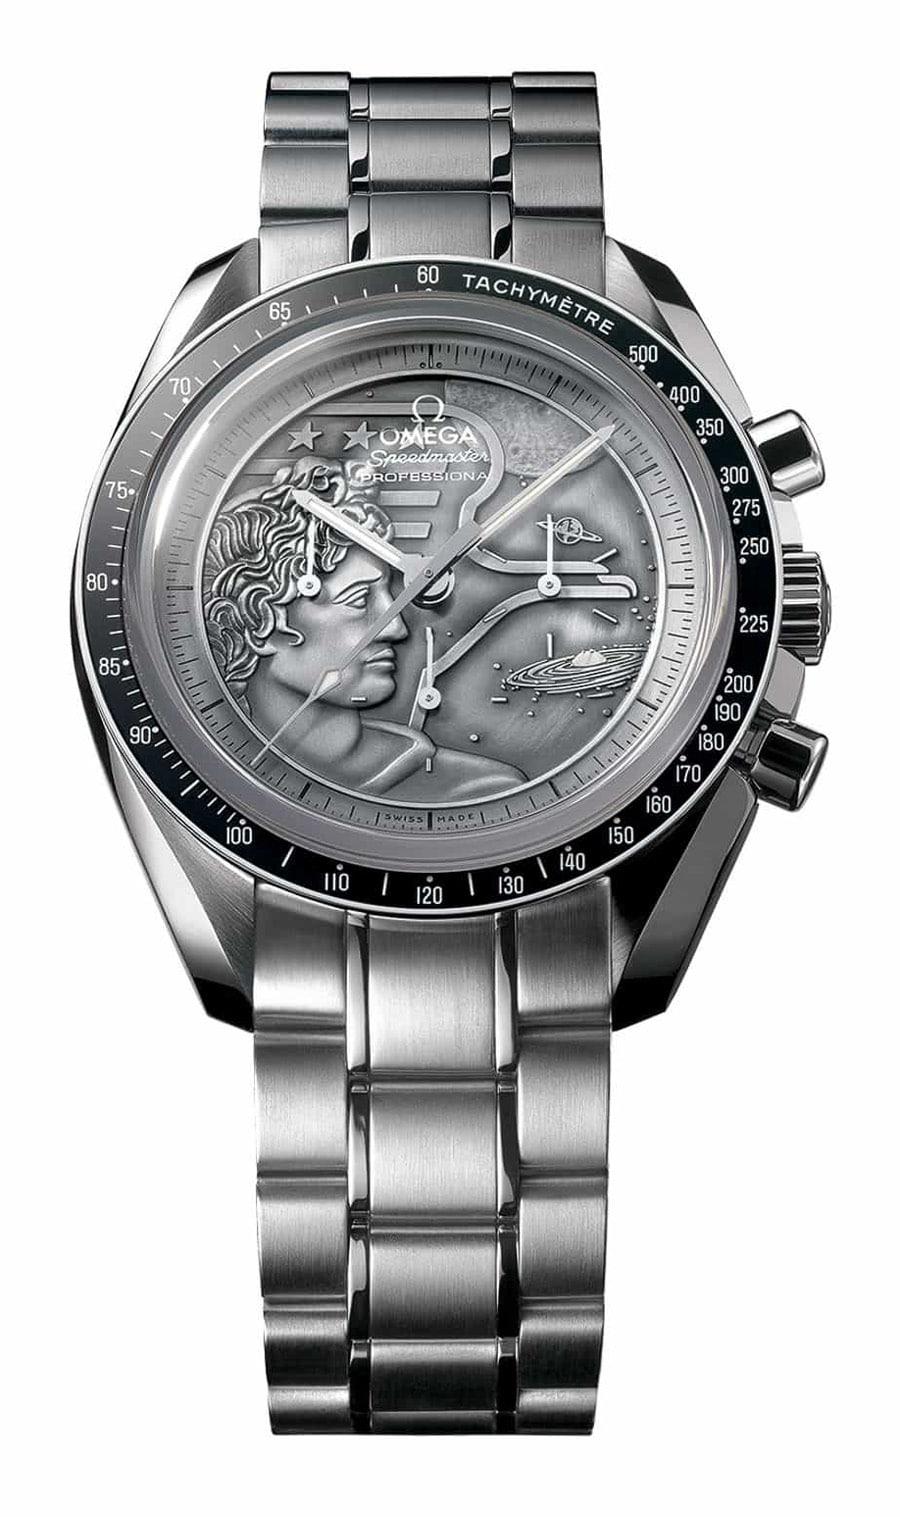 Omega Speedmaster Apollo 17 2012